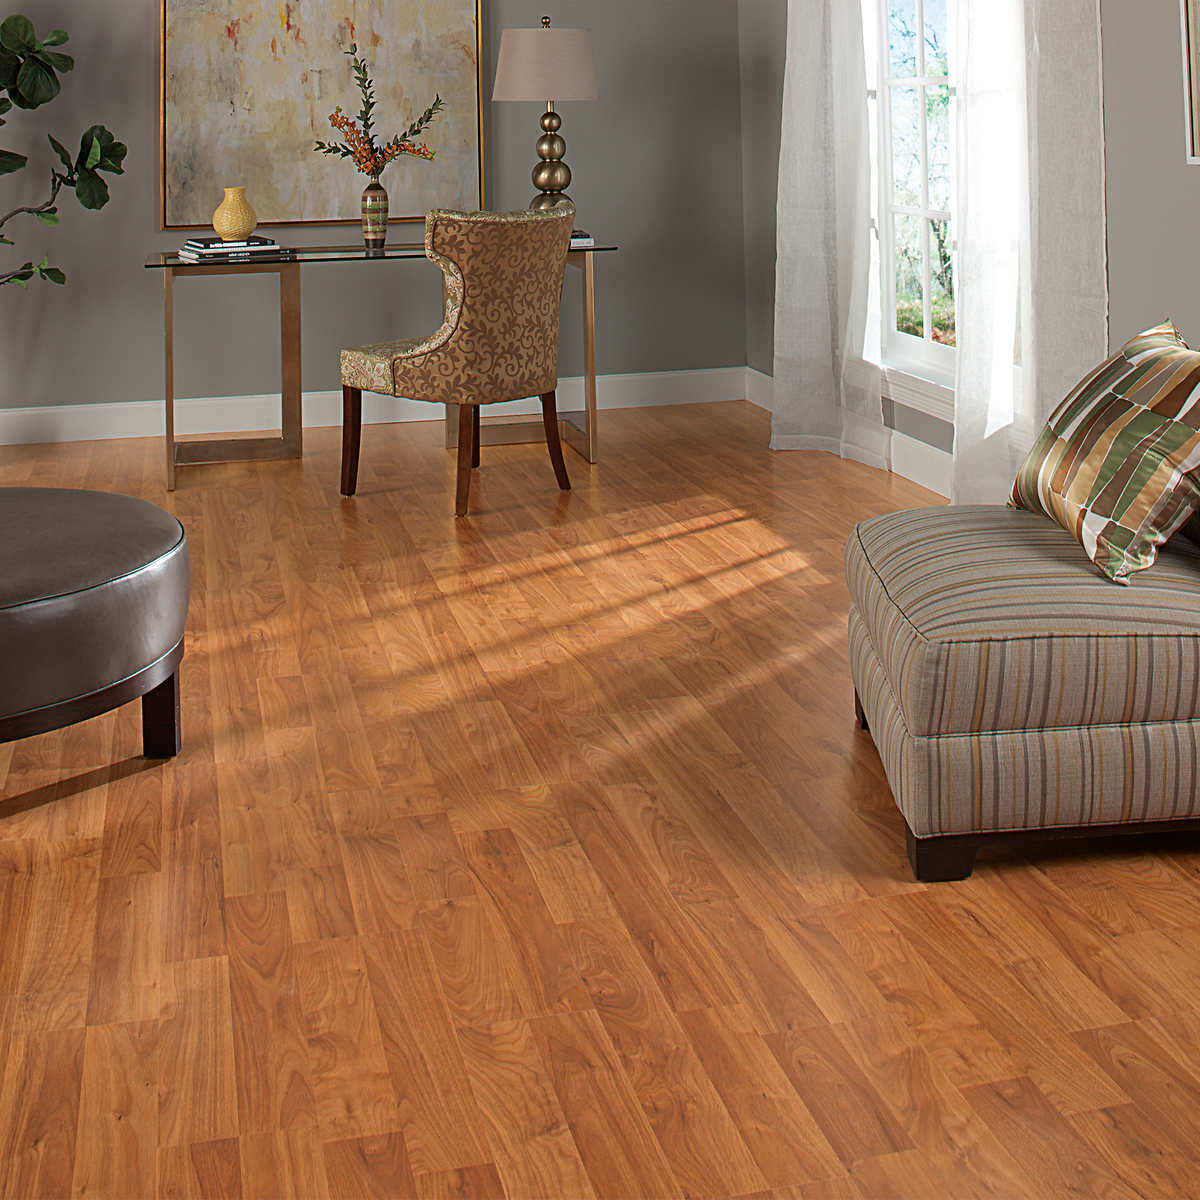 Laminate Flooring Kitchener Laminate Flooring